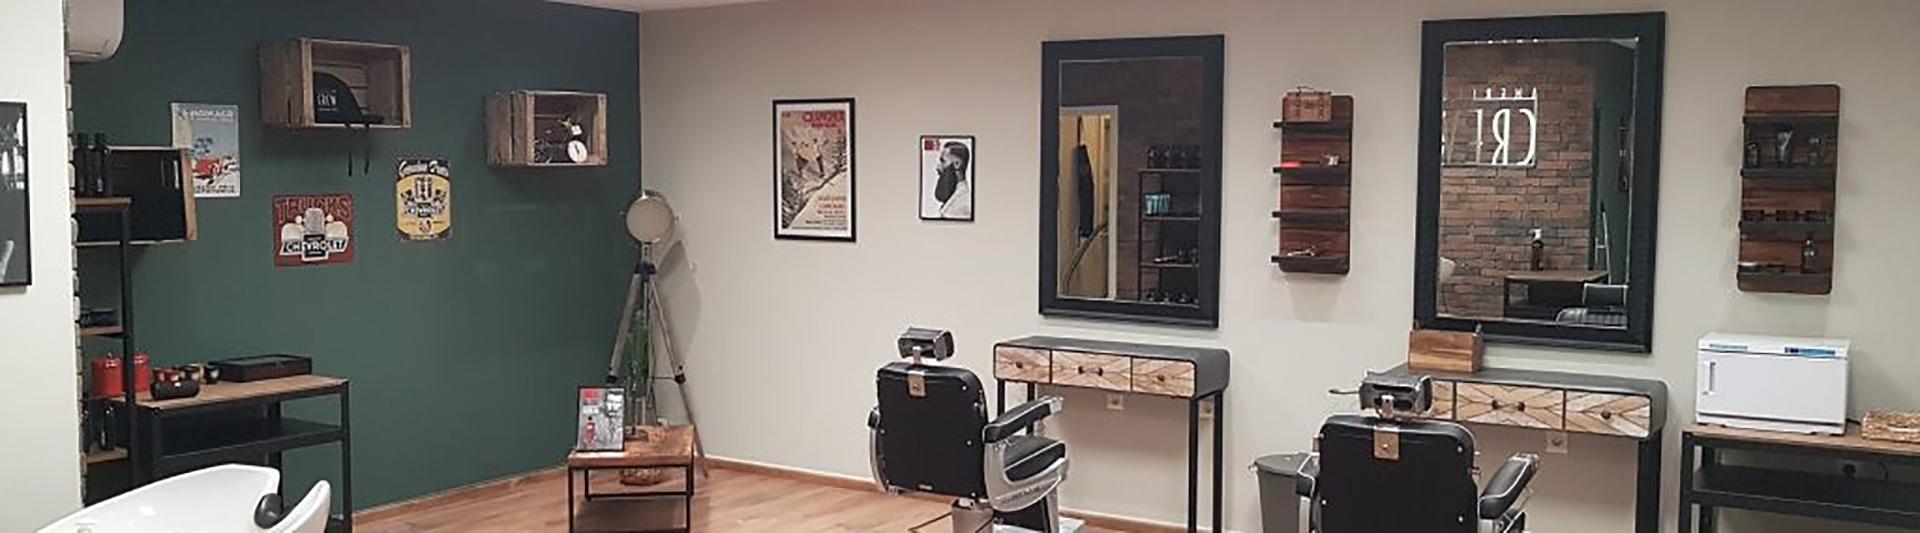 Salon de coiffure à Pradons